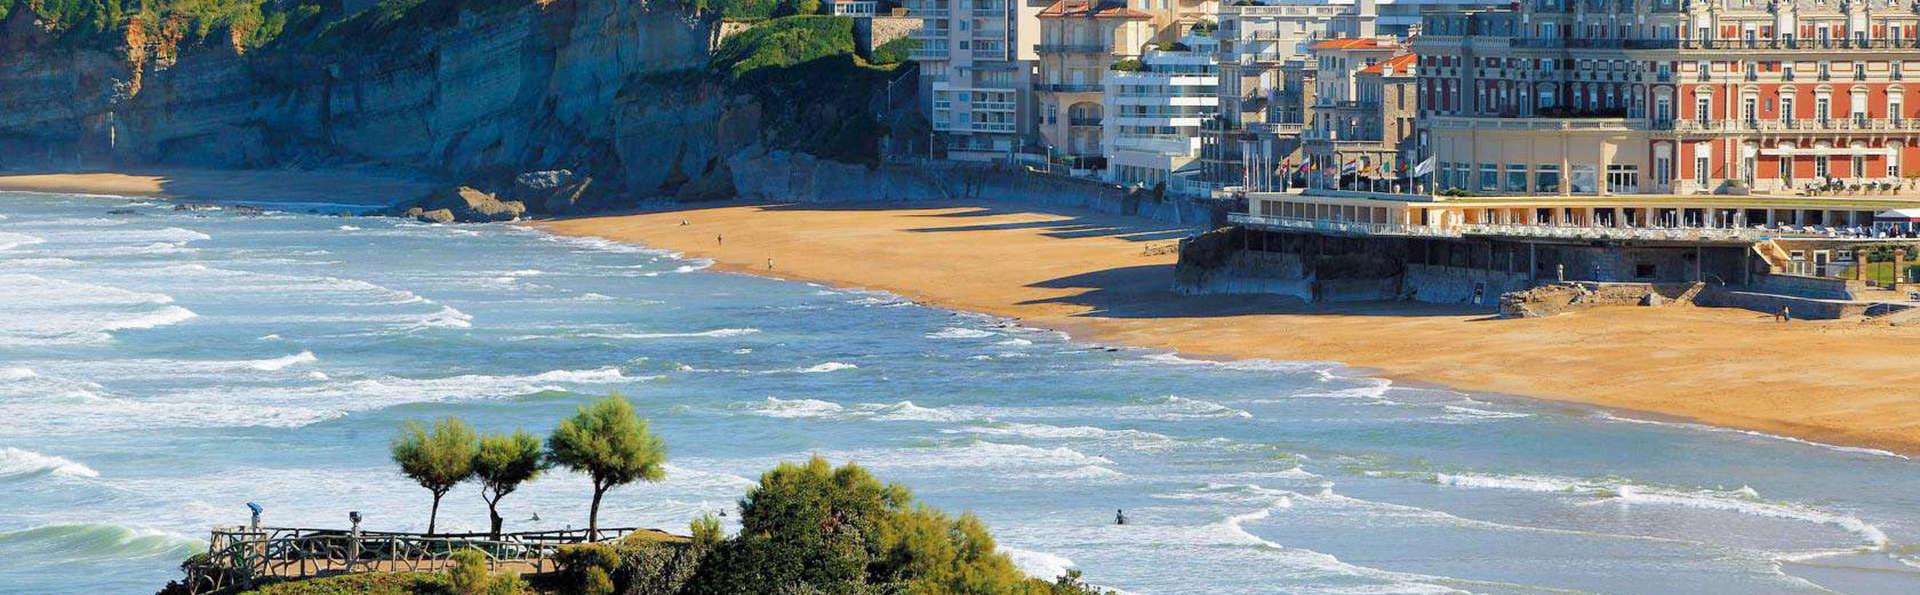 week end a la mer biarritz partir de 107. Black Bedroom Furniture Sets. Home Design Ideas